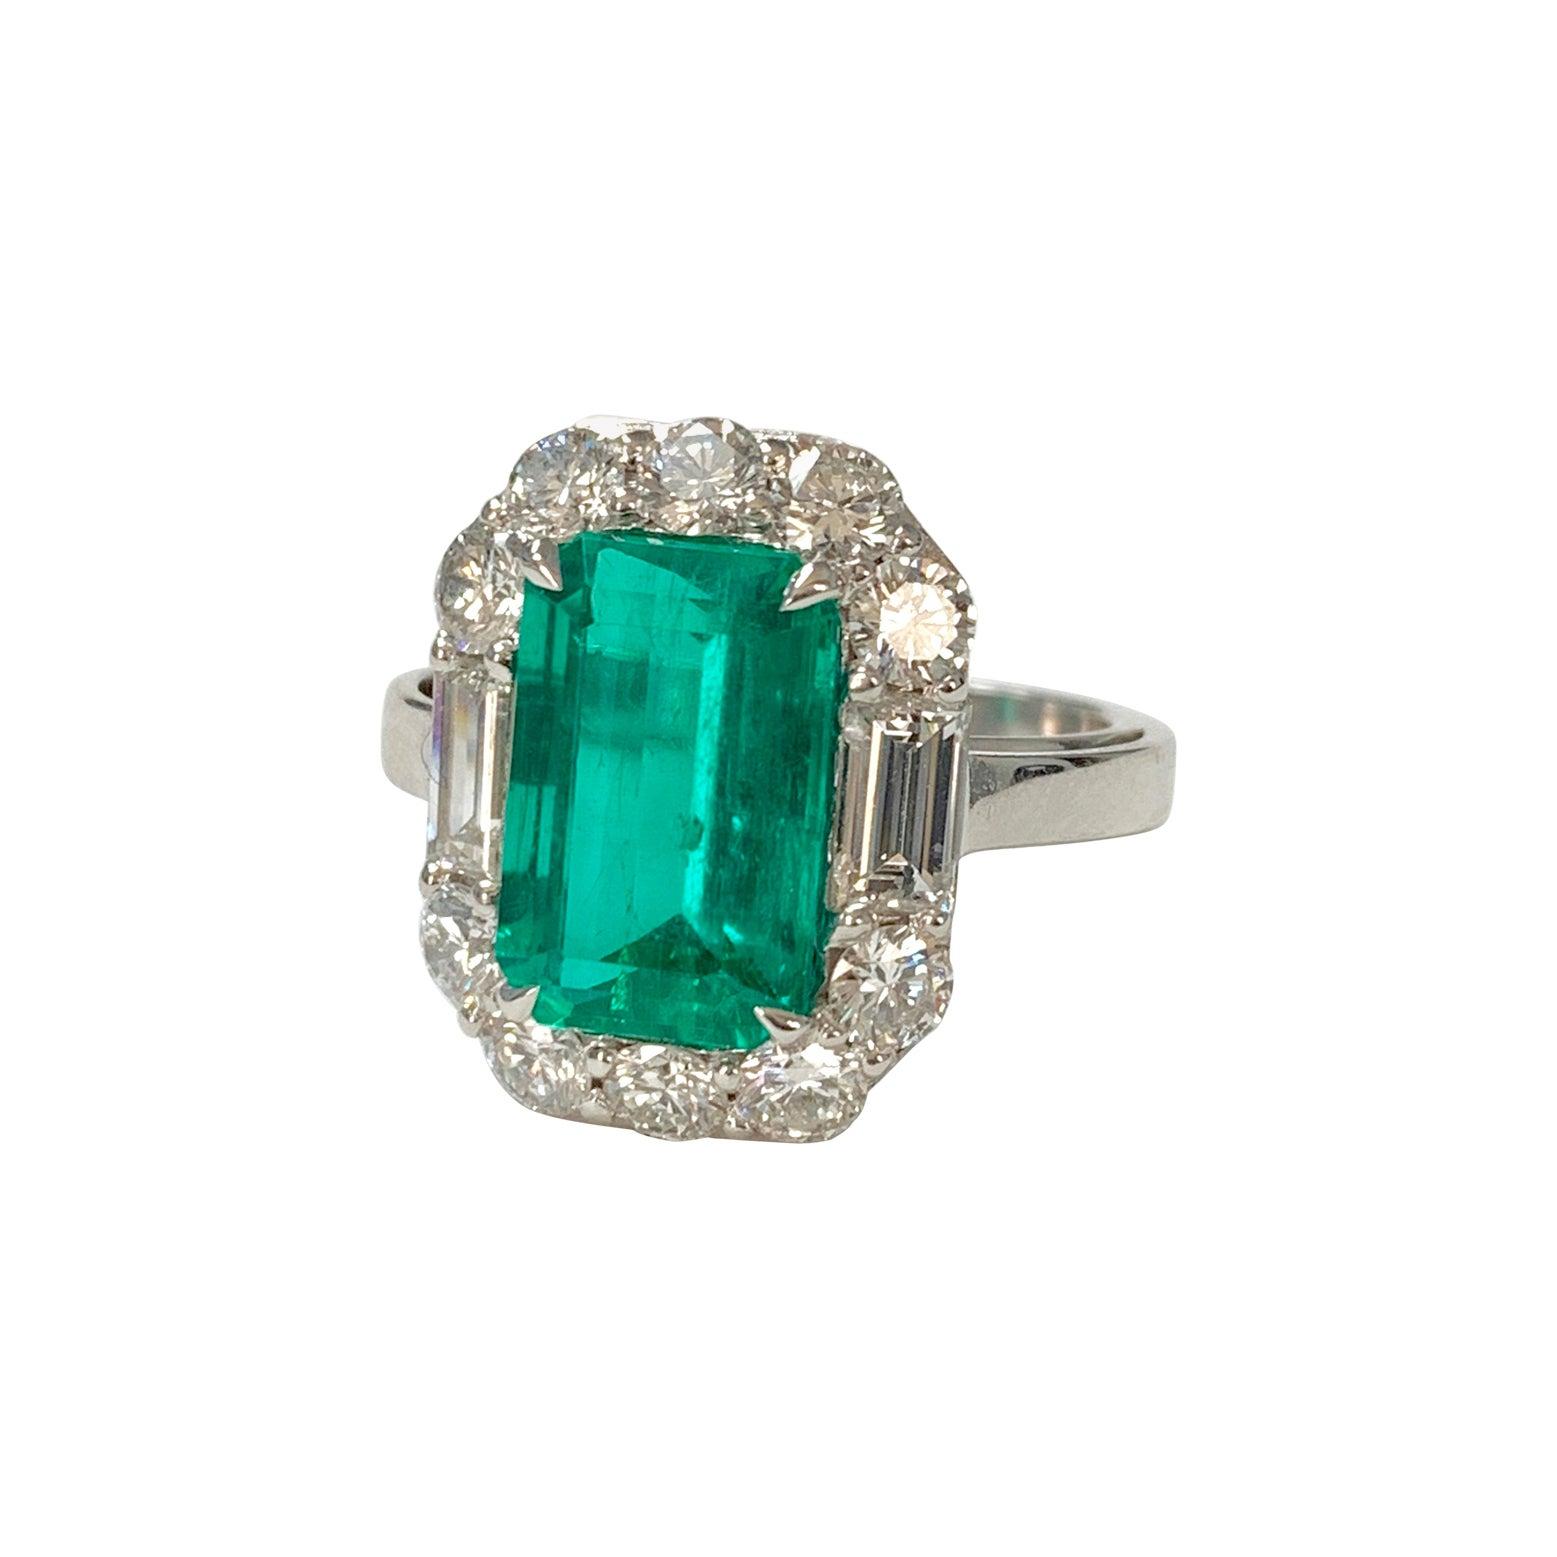 3.63 Carat Columbian Emerald and Diamond Ring in 18K White Gold